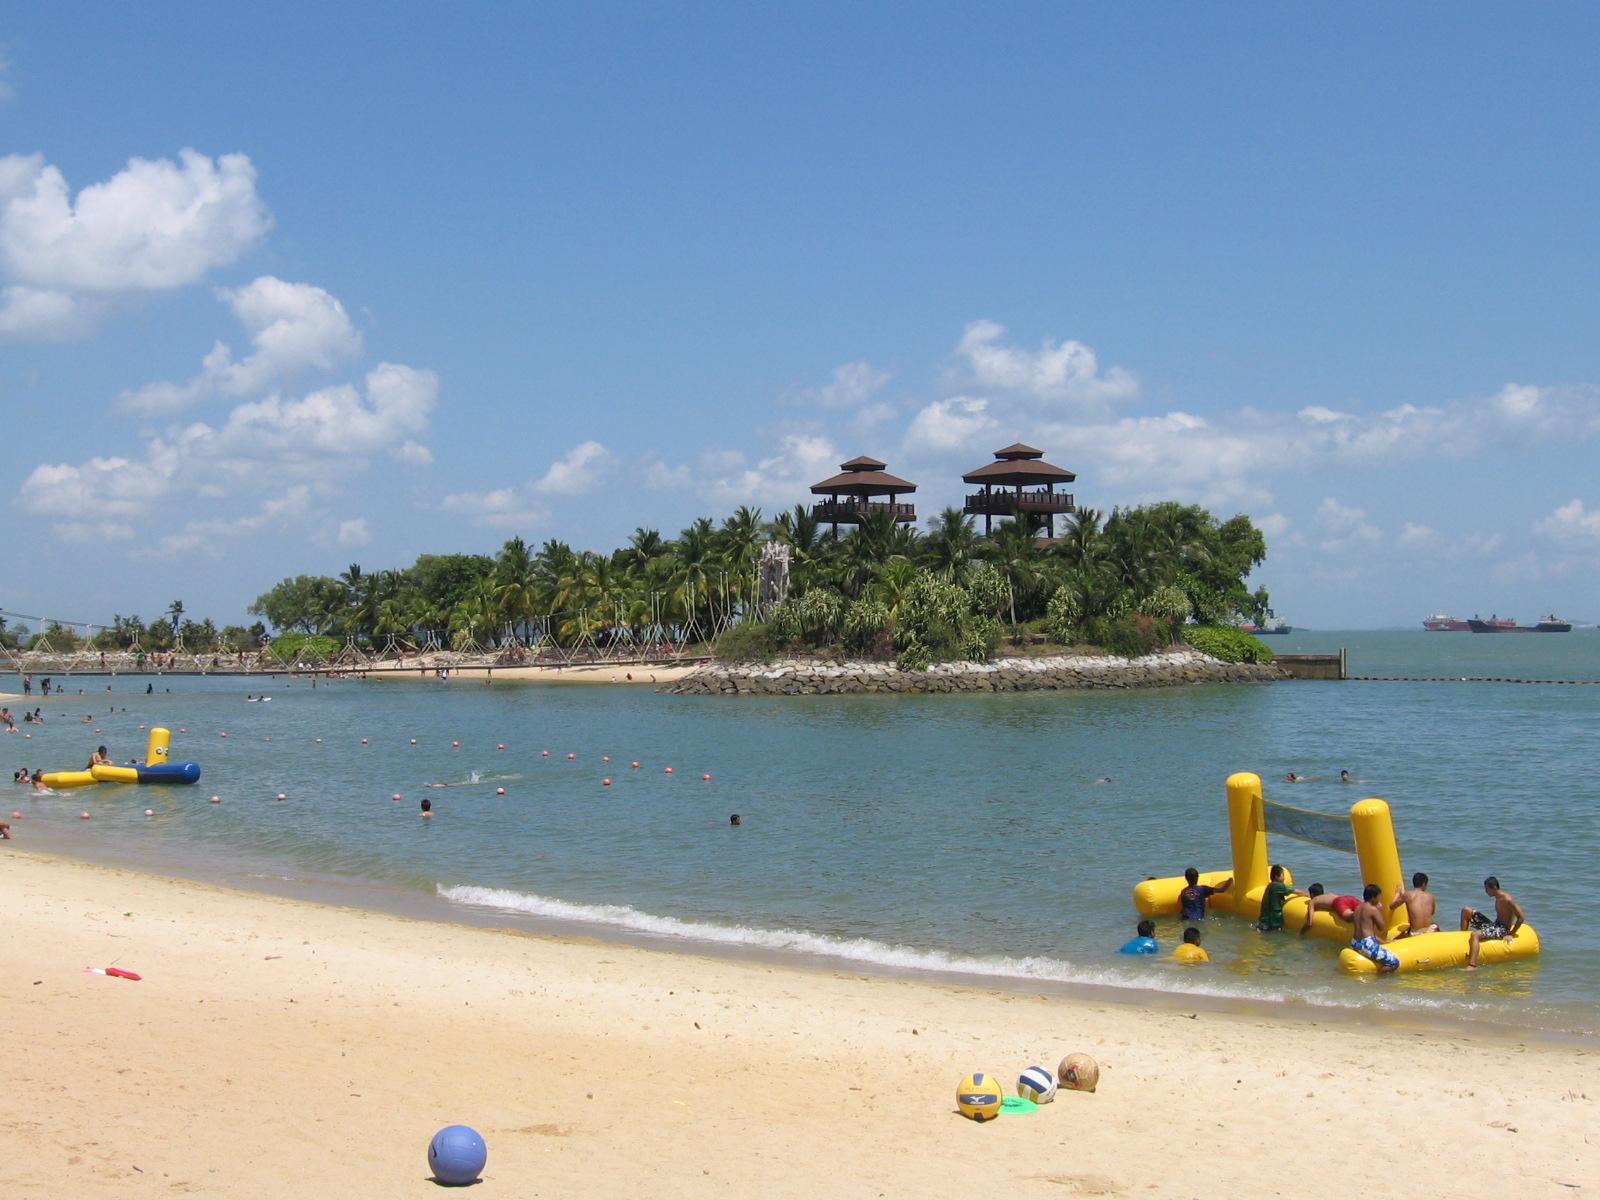 Palawan Beach's Attractions